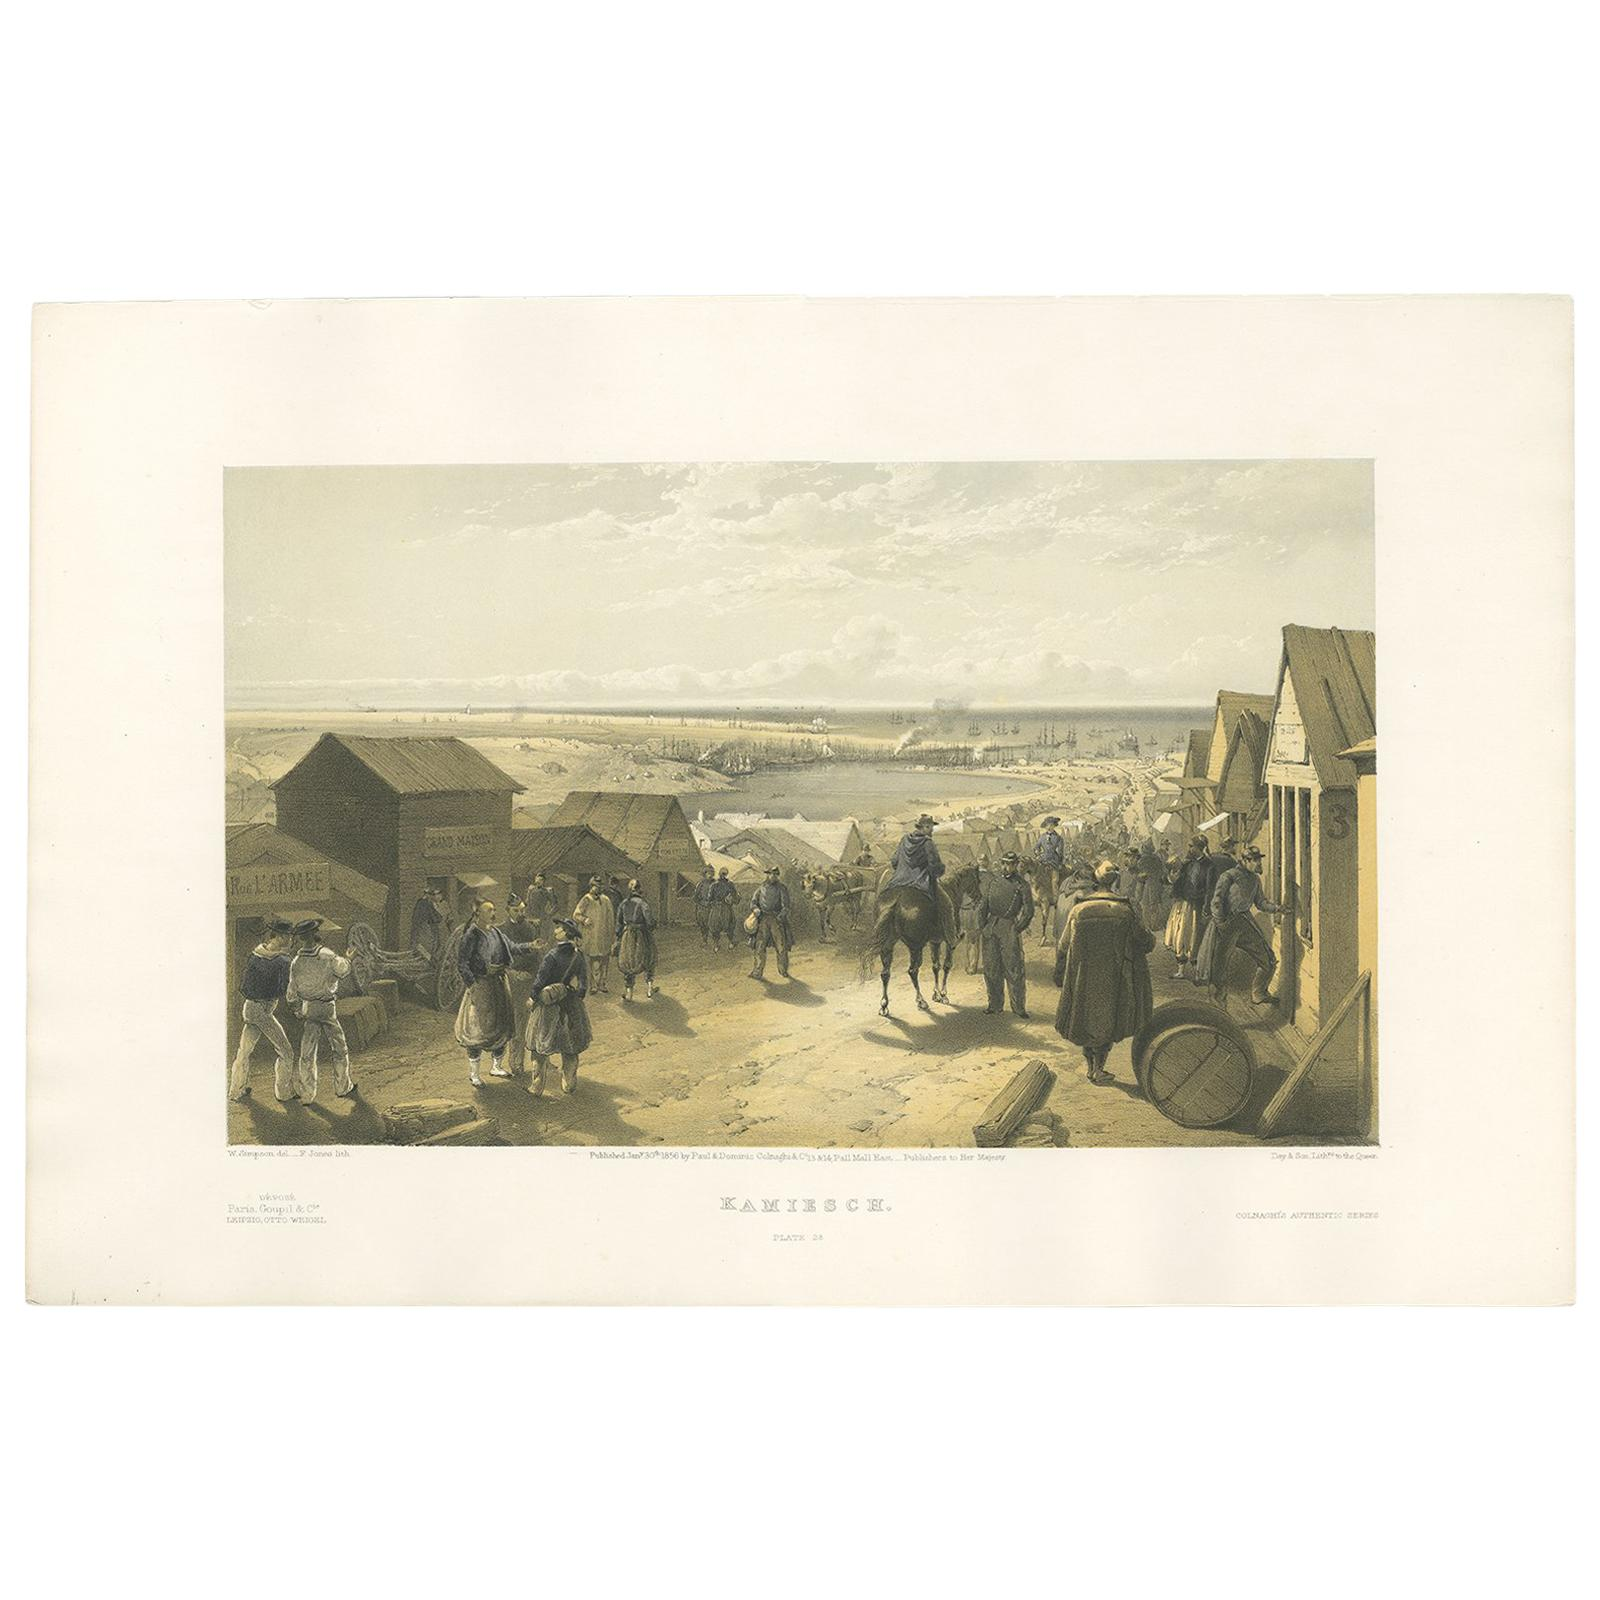 Antique Print of Kamiesch 'Crimean War' by W. Simpson, 1855